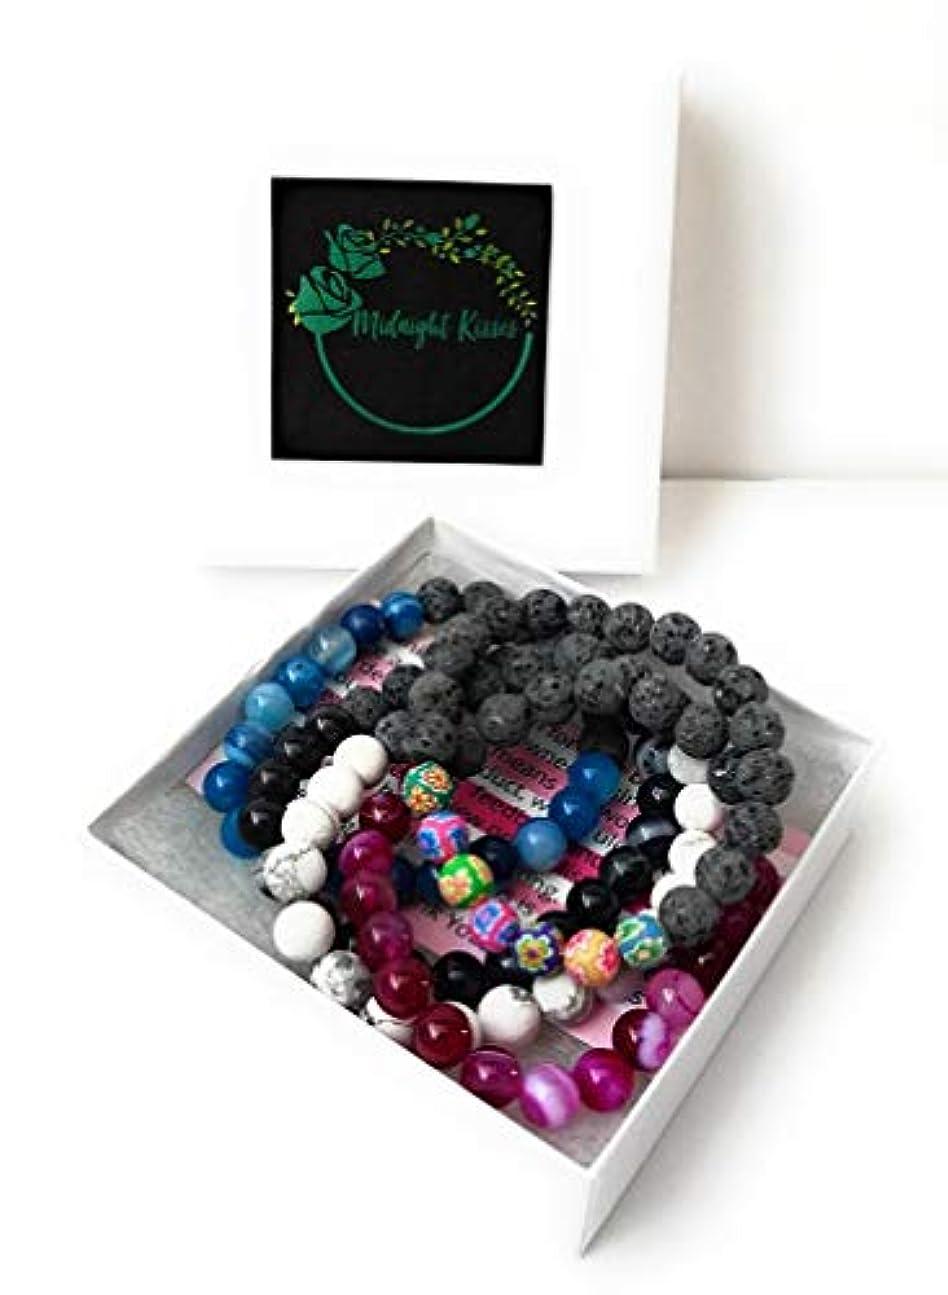 Authenticラバストーンブレスレットfor Women Essential Oilアロマテラピーの理想的なストレス&不安relief-chakra Diffuser Healing Rock beads-meditation...